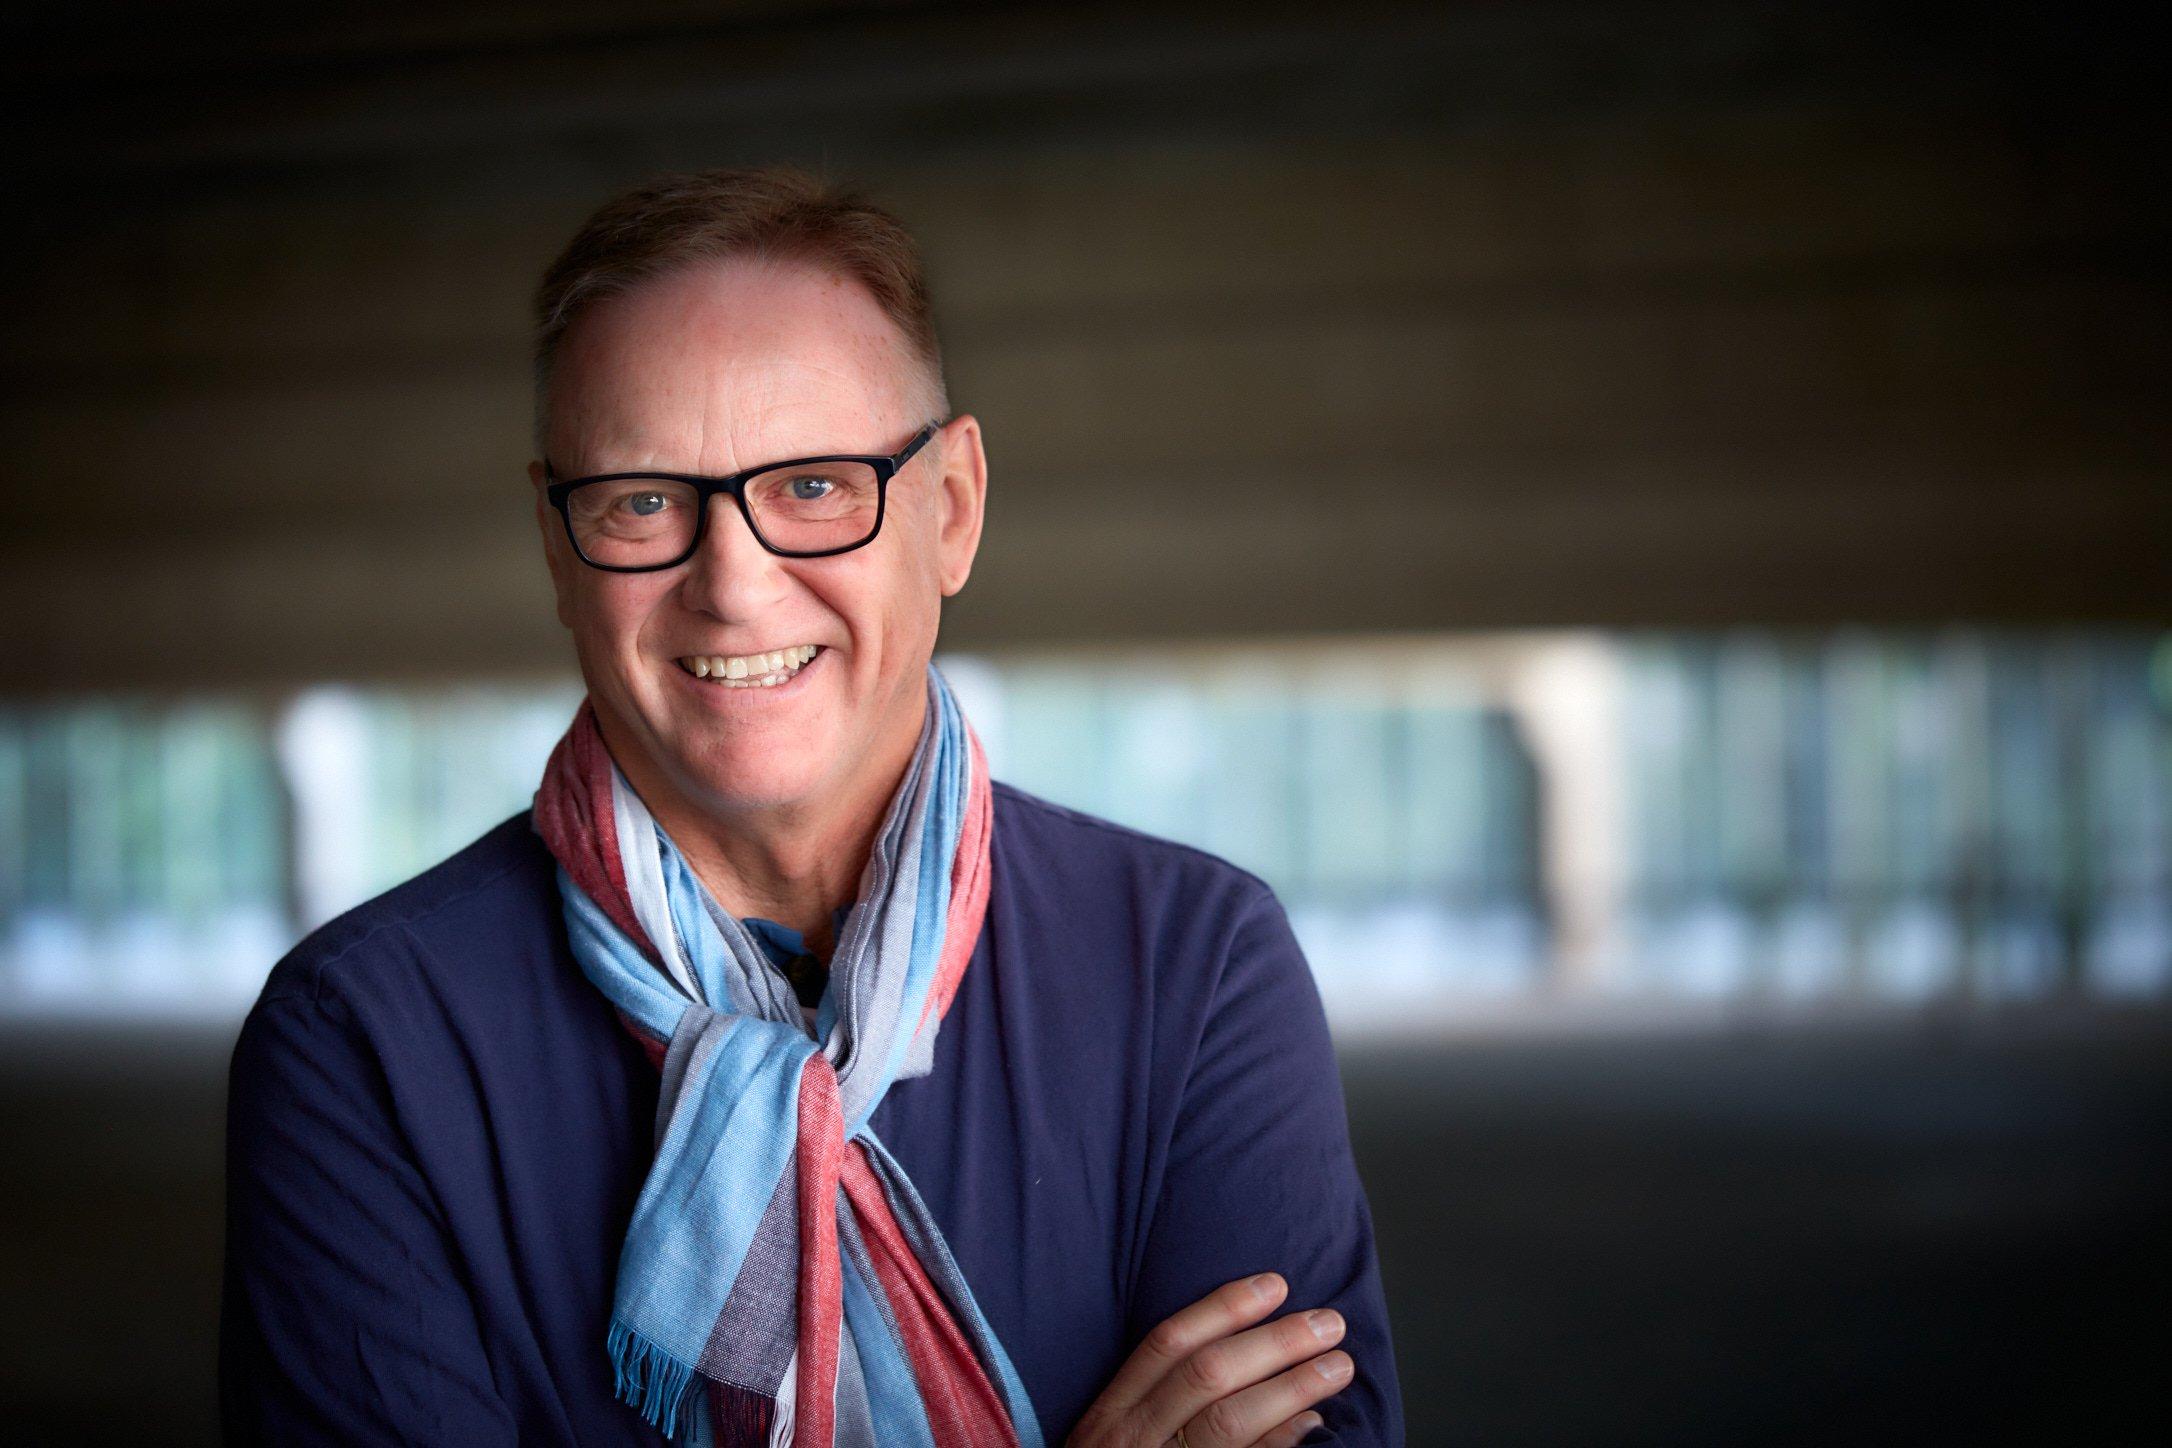 Profilfoto Jan Peter Aursnes - osteperler